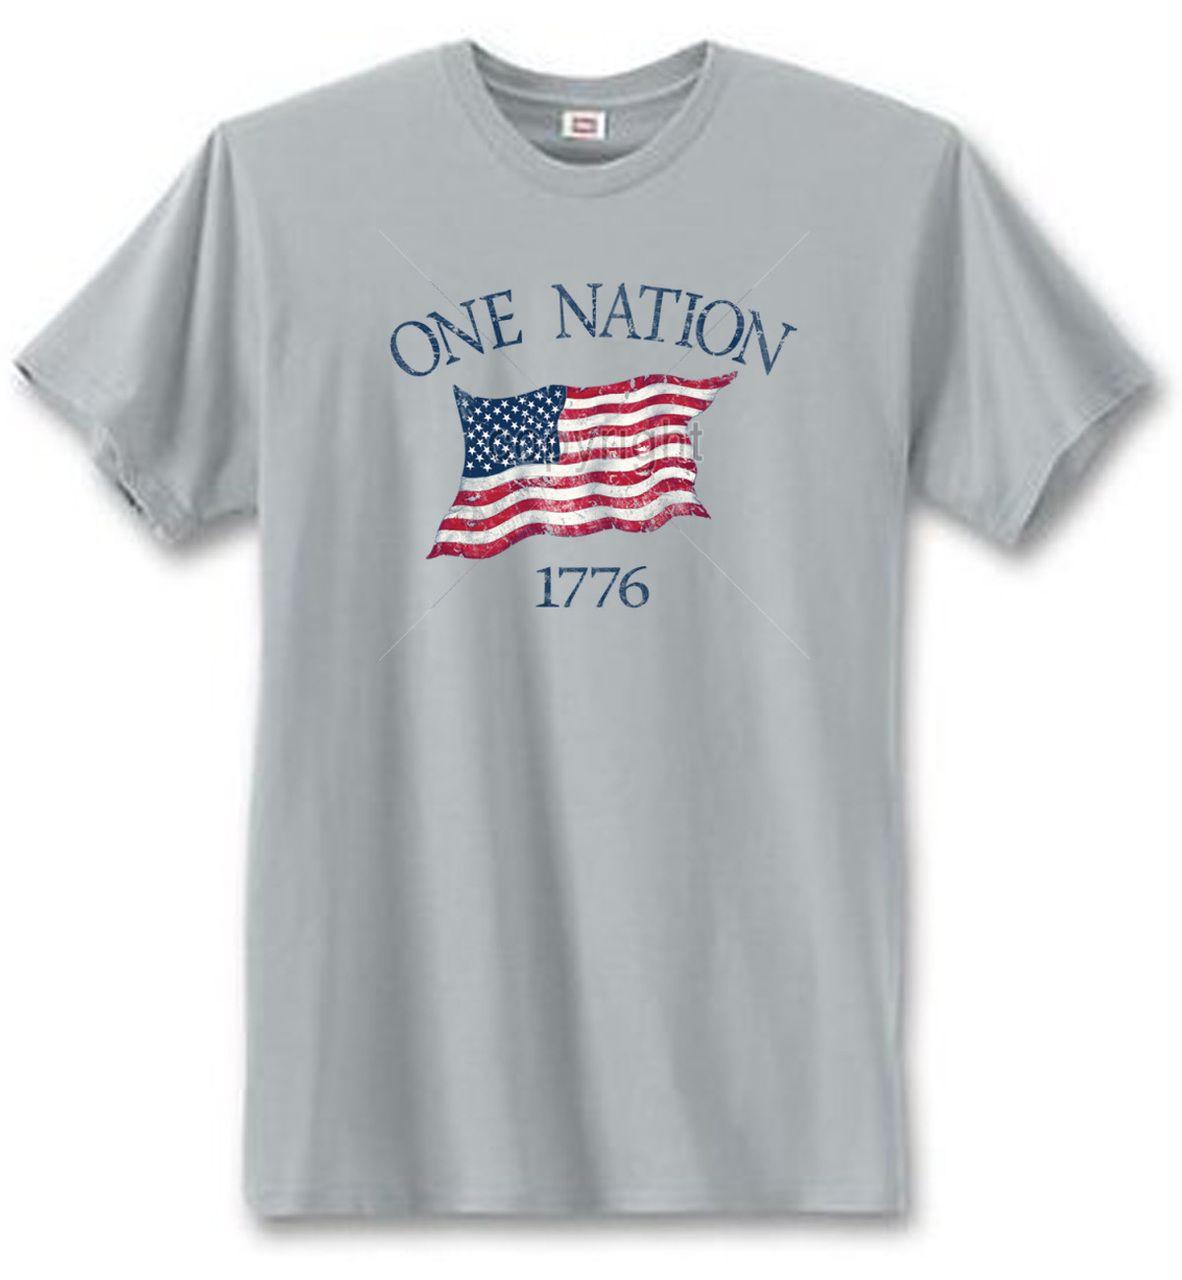 U.S. Custom Tees - One Nation 1776 T-Shirt, $12.50 (http://www.uscustomtees.com/one-nation-1776-t-shirt/)